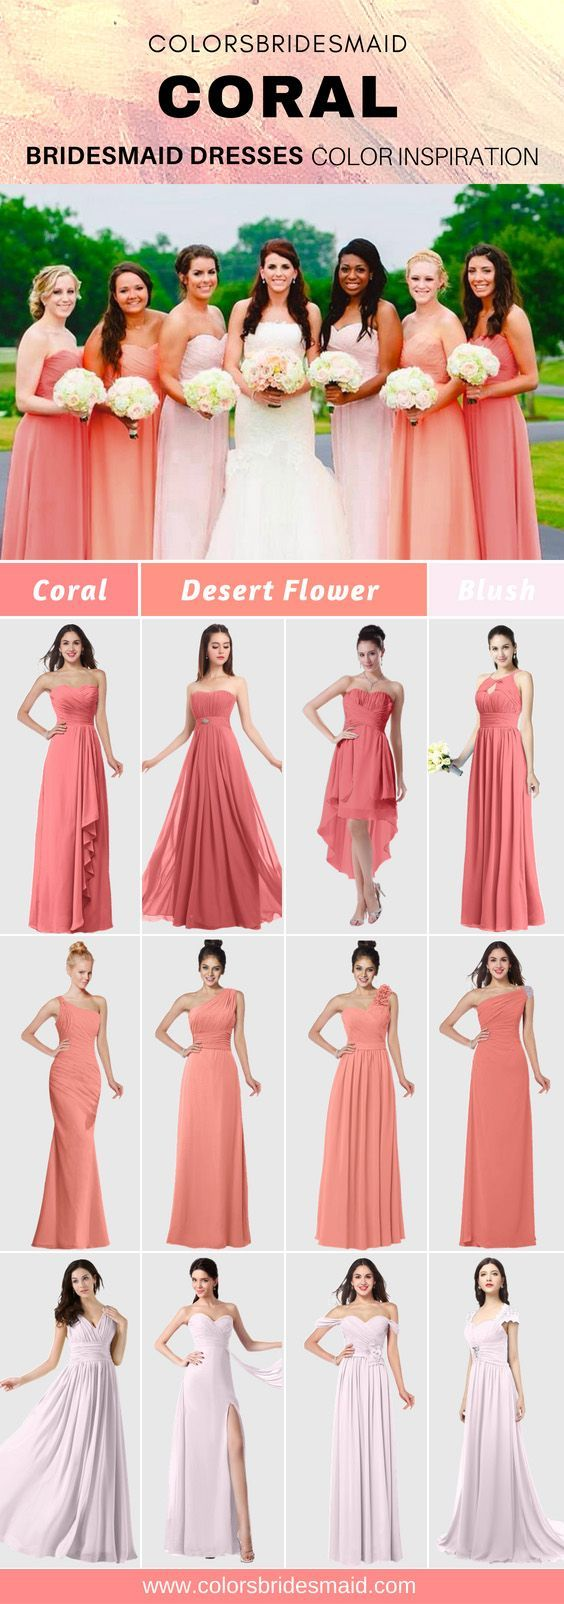 Coral Bridesmaid Dresses Coral Bridesmaid Dresses Bridesmaid Dresses coral bridesmaid dresses